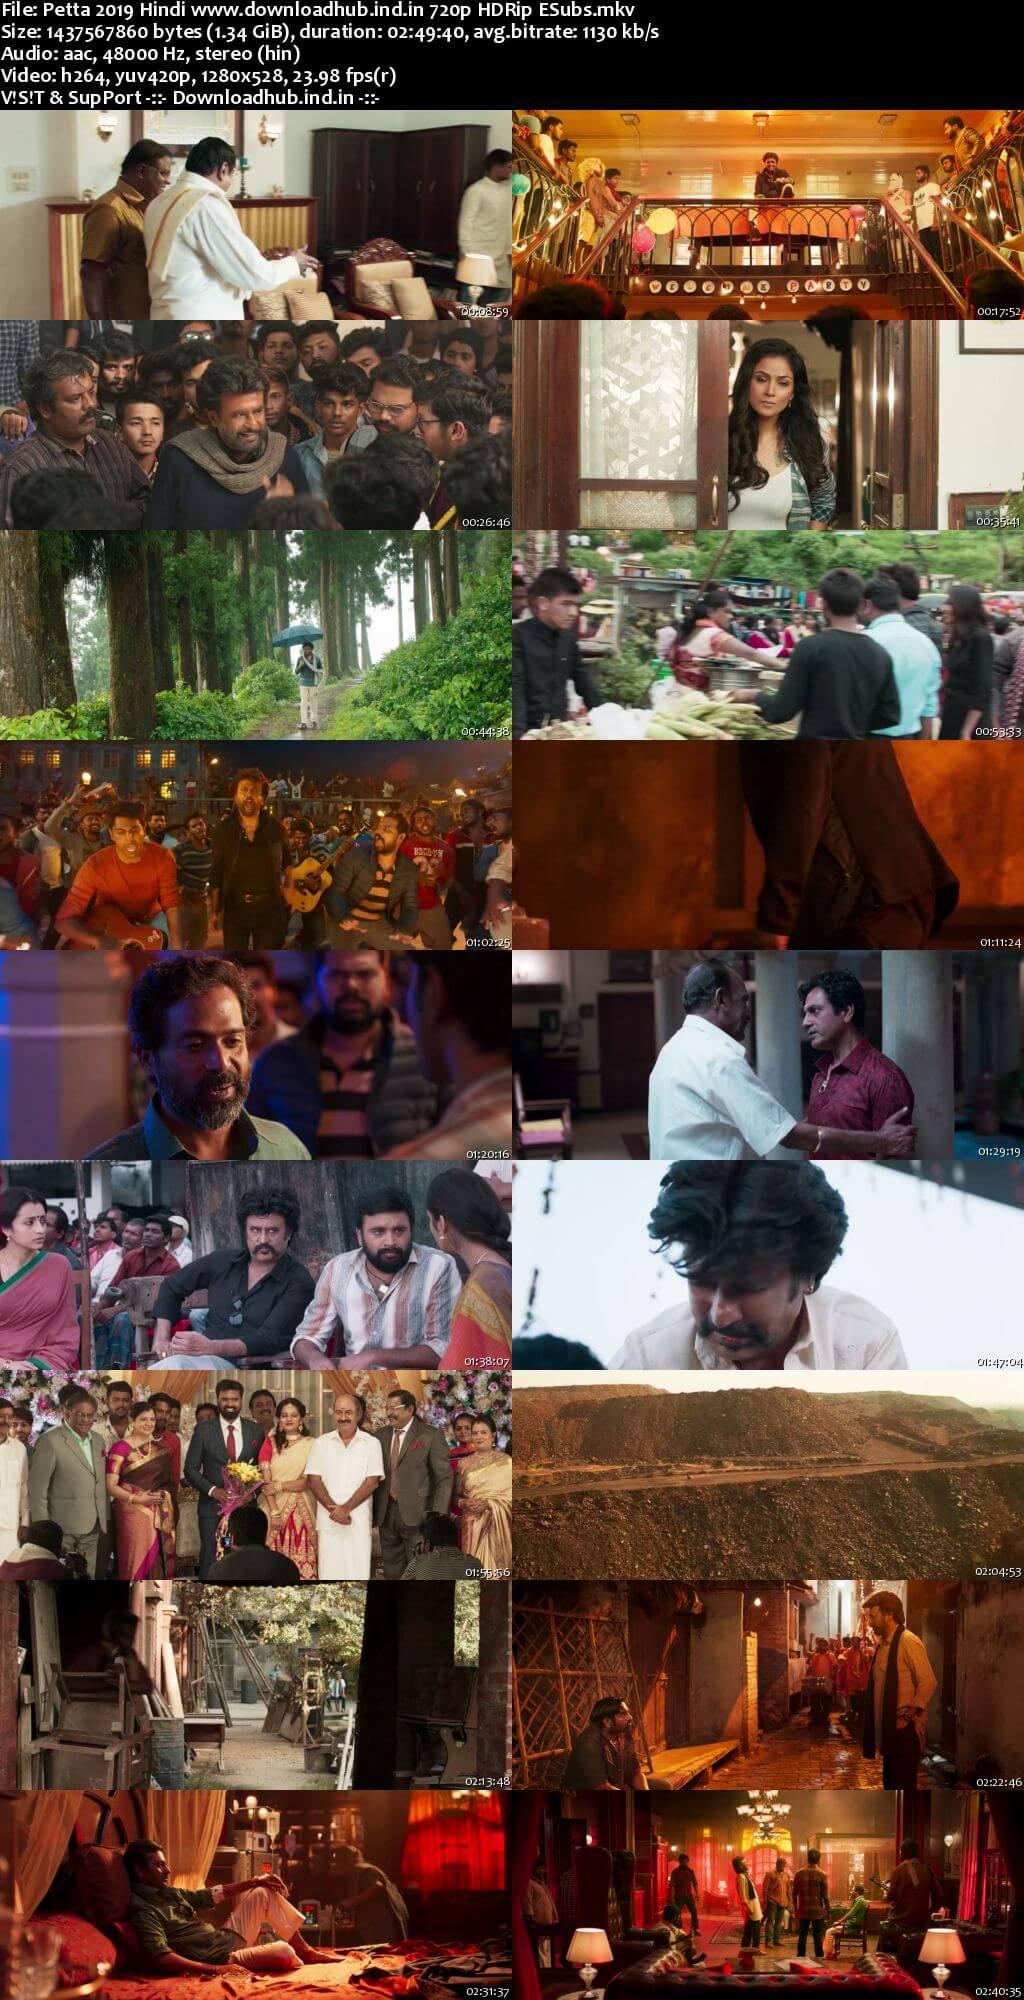 Petta 2019 Hindi 720p HDRip ESubs